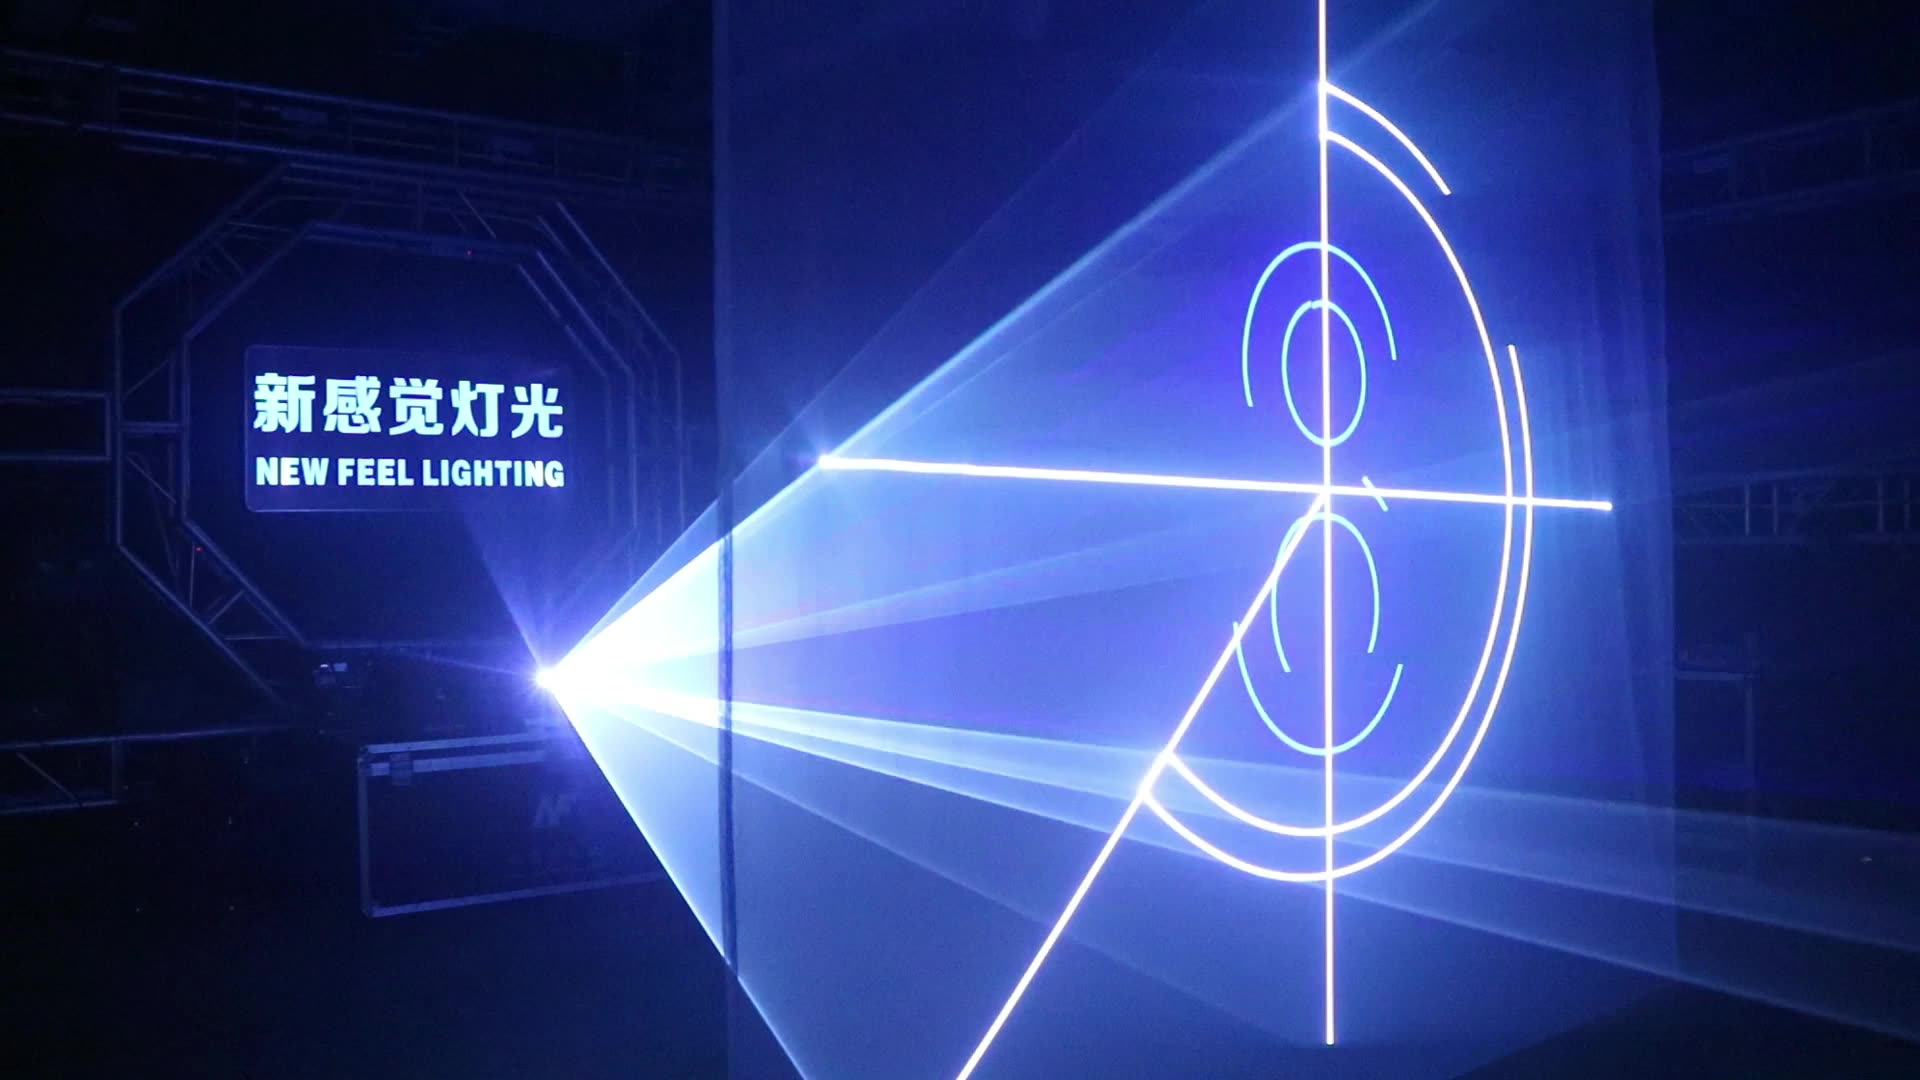 F760 10 واط 40K ILDA الليزر 40Kpps الماسح الضوئي المرحلة تظهر شعاع الإضاءة Dj نادي الحدث RGB كامل اللون ليزر الرسوم المتحركة الخفيفة